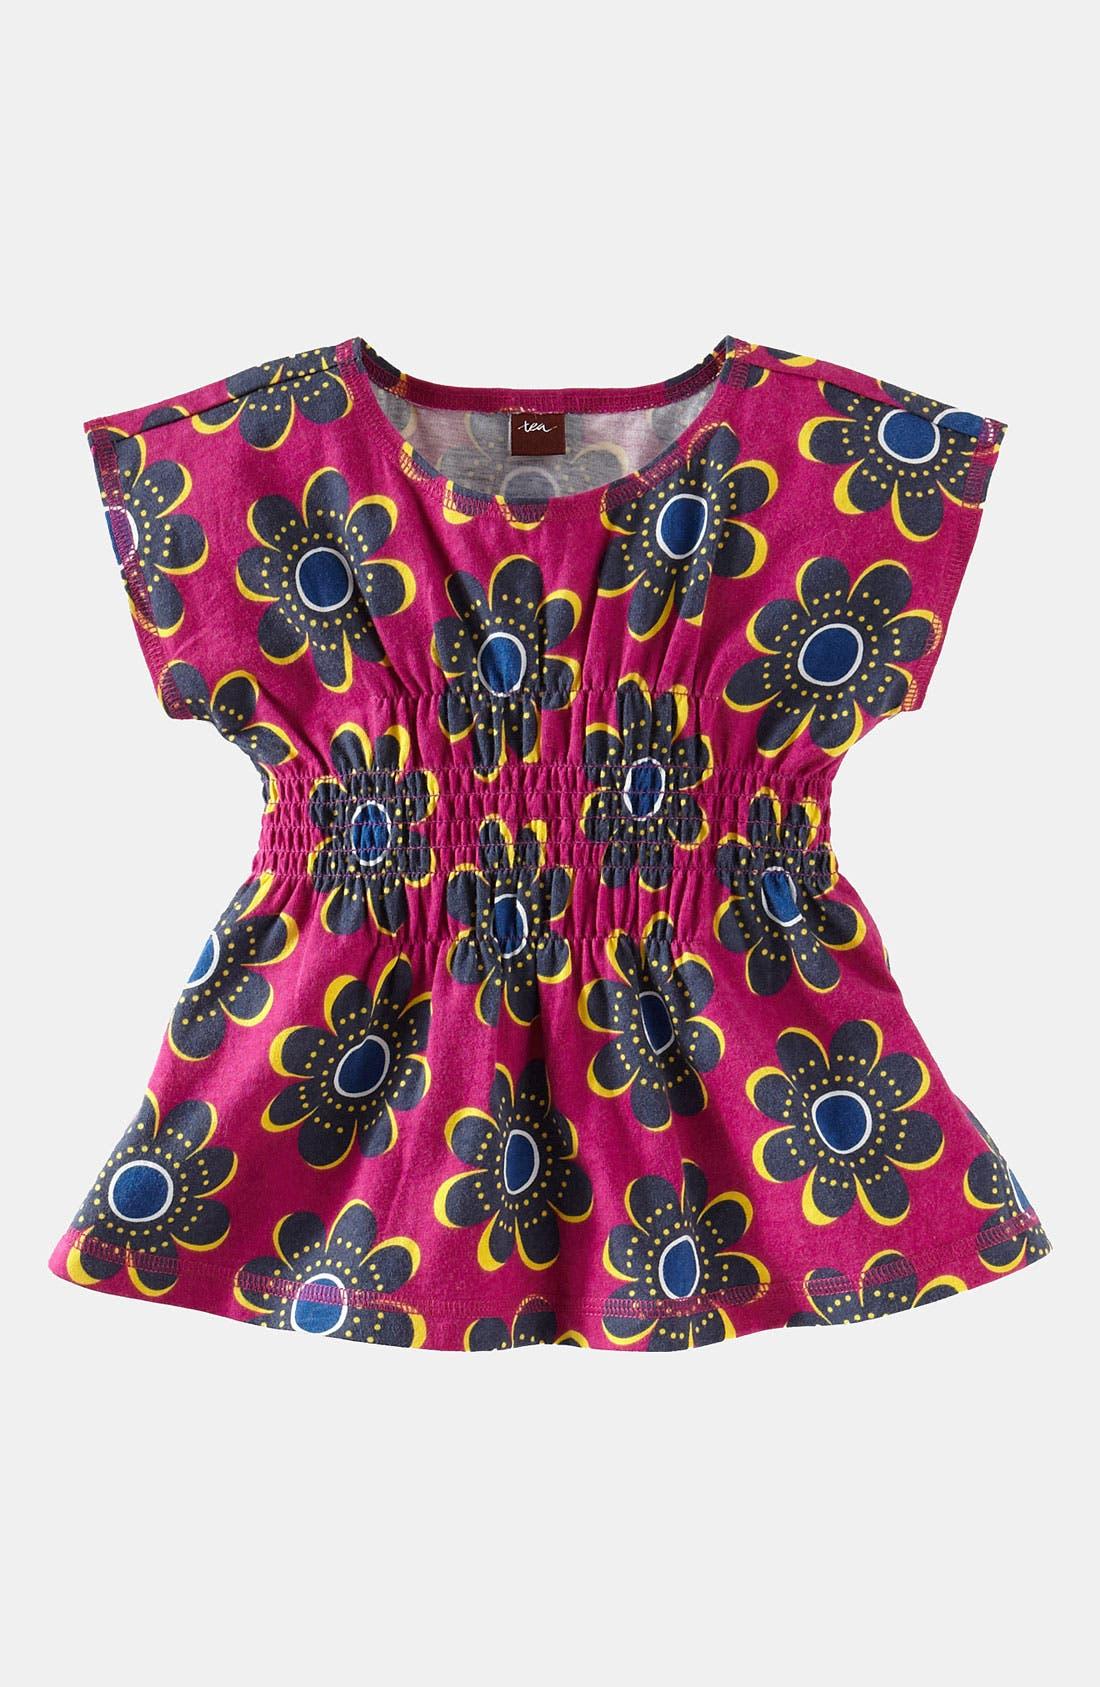 Main Image - Tea Collection 'Rosebank' Smocked Top (Little Girls & Big Girls)